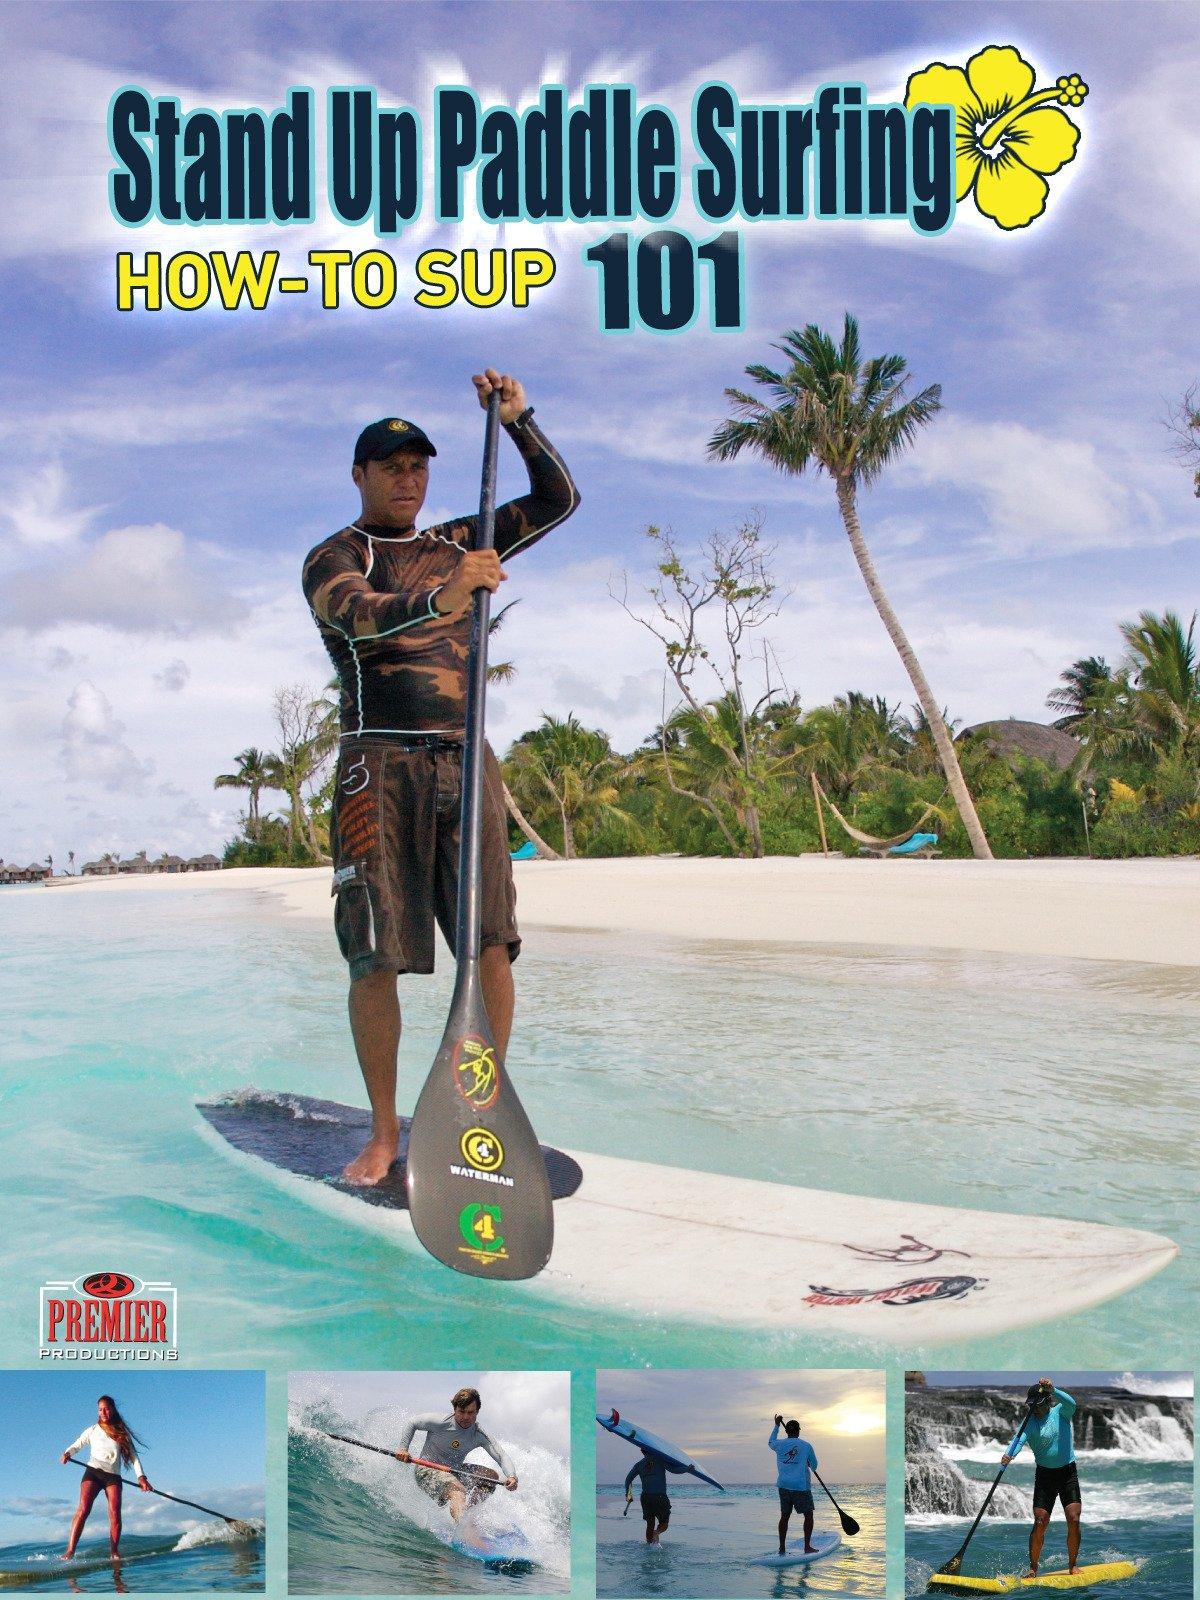 Amazon.com: How-To SUP 101 Stand Up Paddle Surfing: Premier Productions Hawaii, Brian Keaulana, Todd Bradley, Ivan van Vuuren: Amazon Digital Services LLC